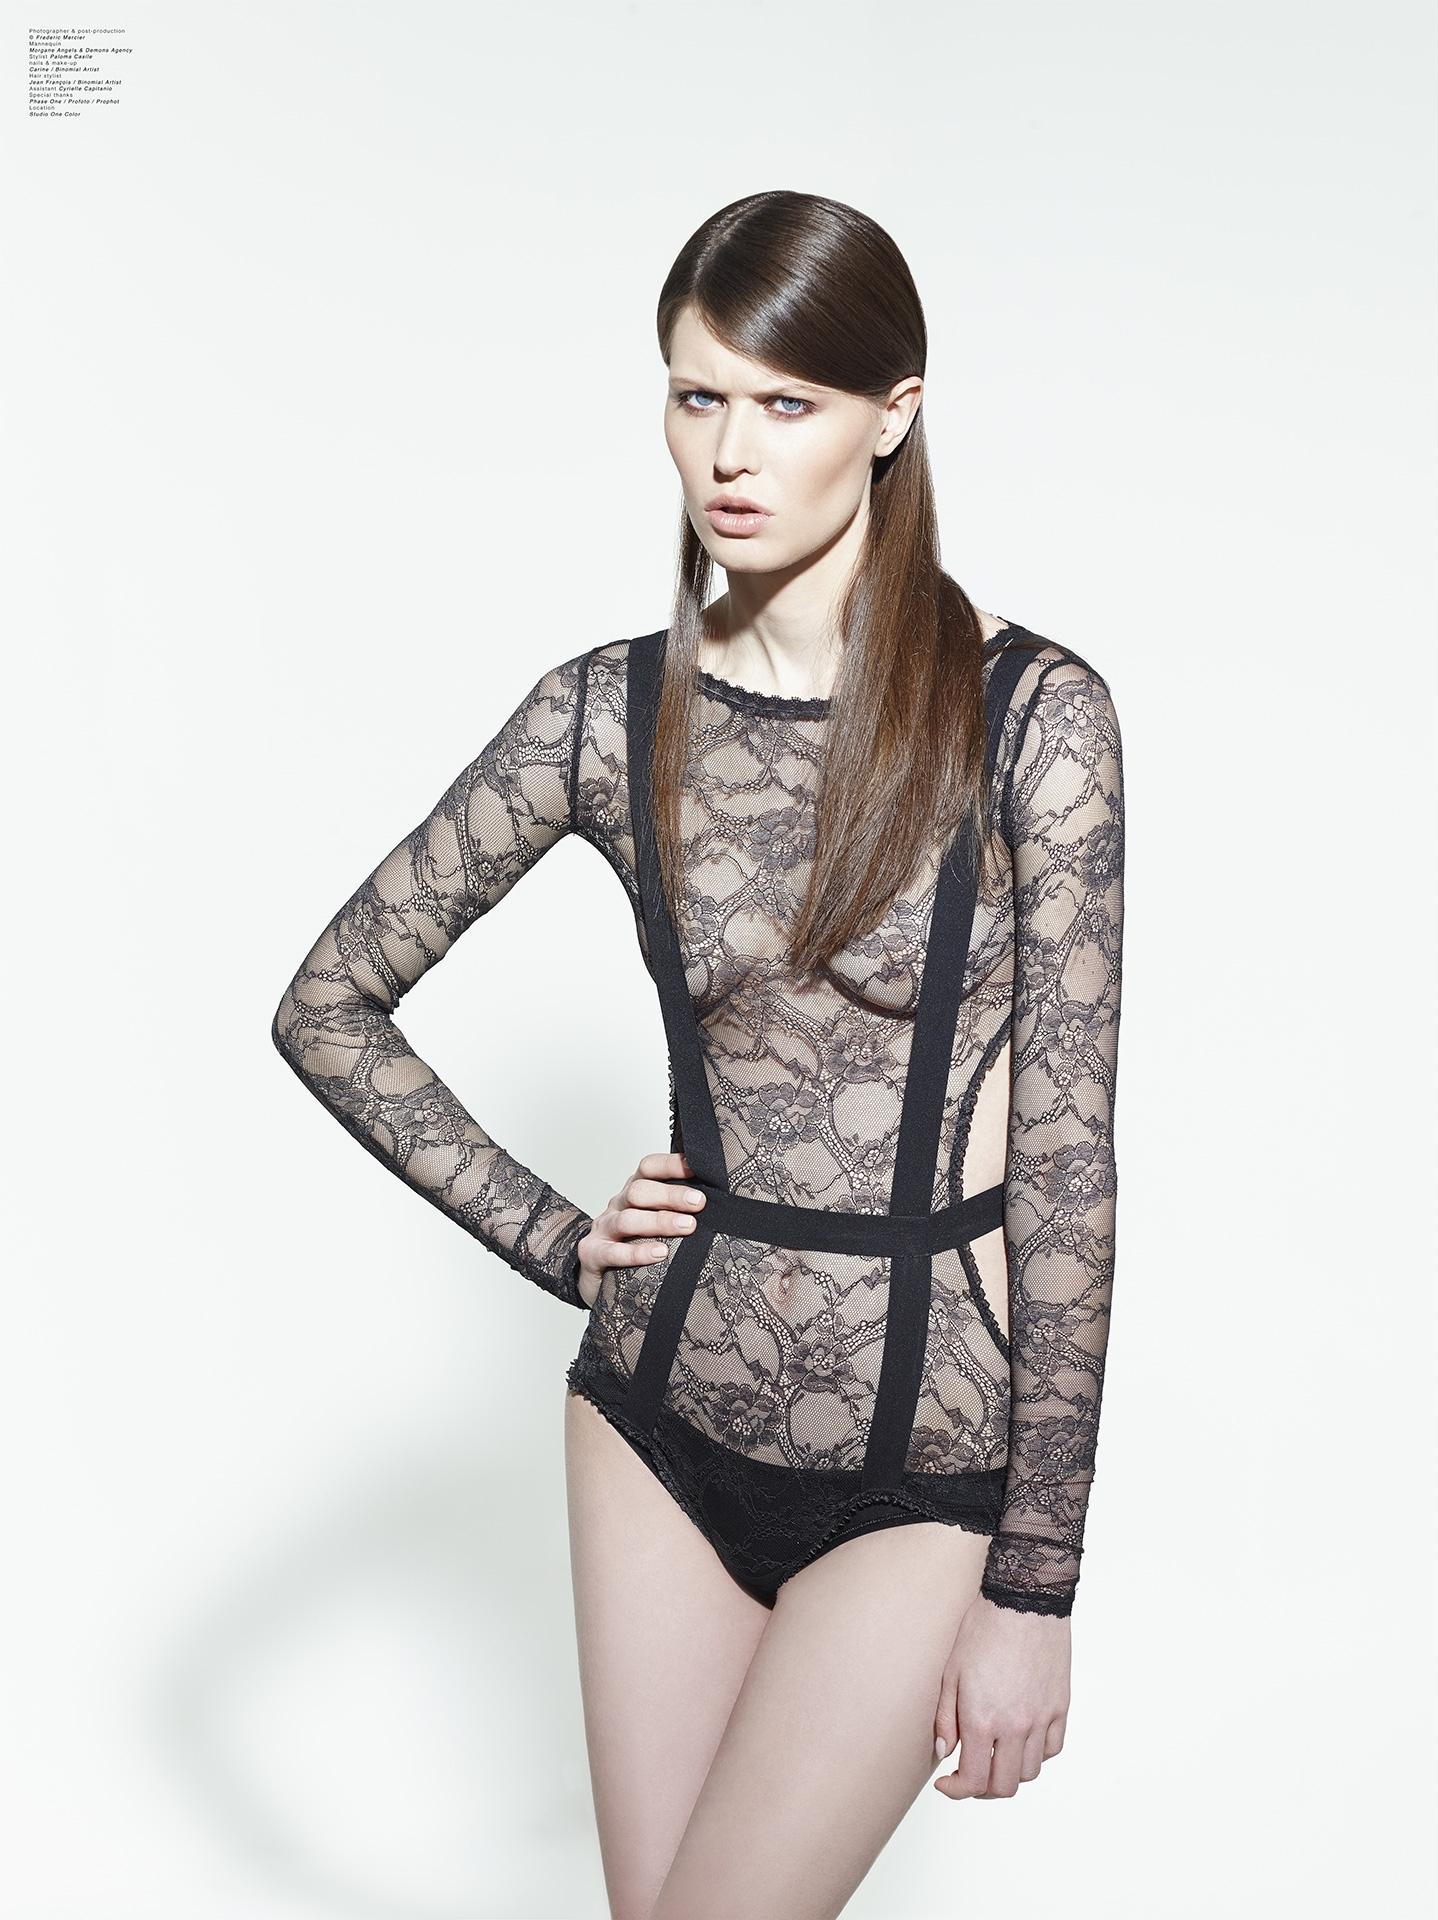 paloma casile aw 2013 campaign lingerie underwear frederic mercier fashion photographer one color